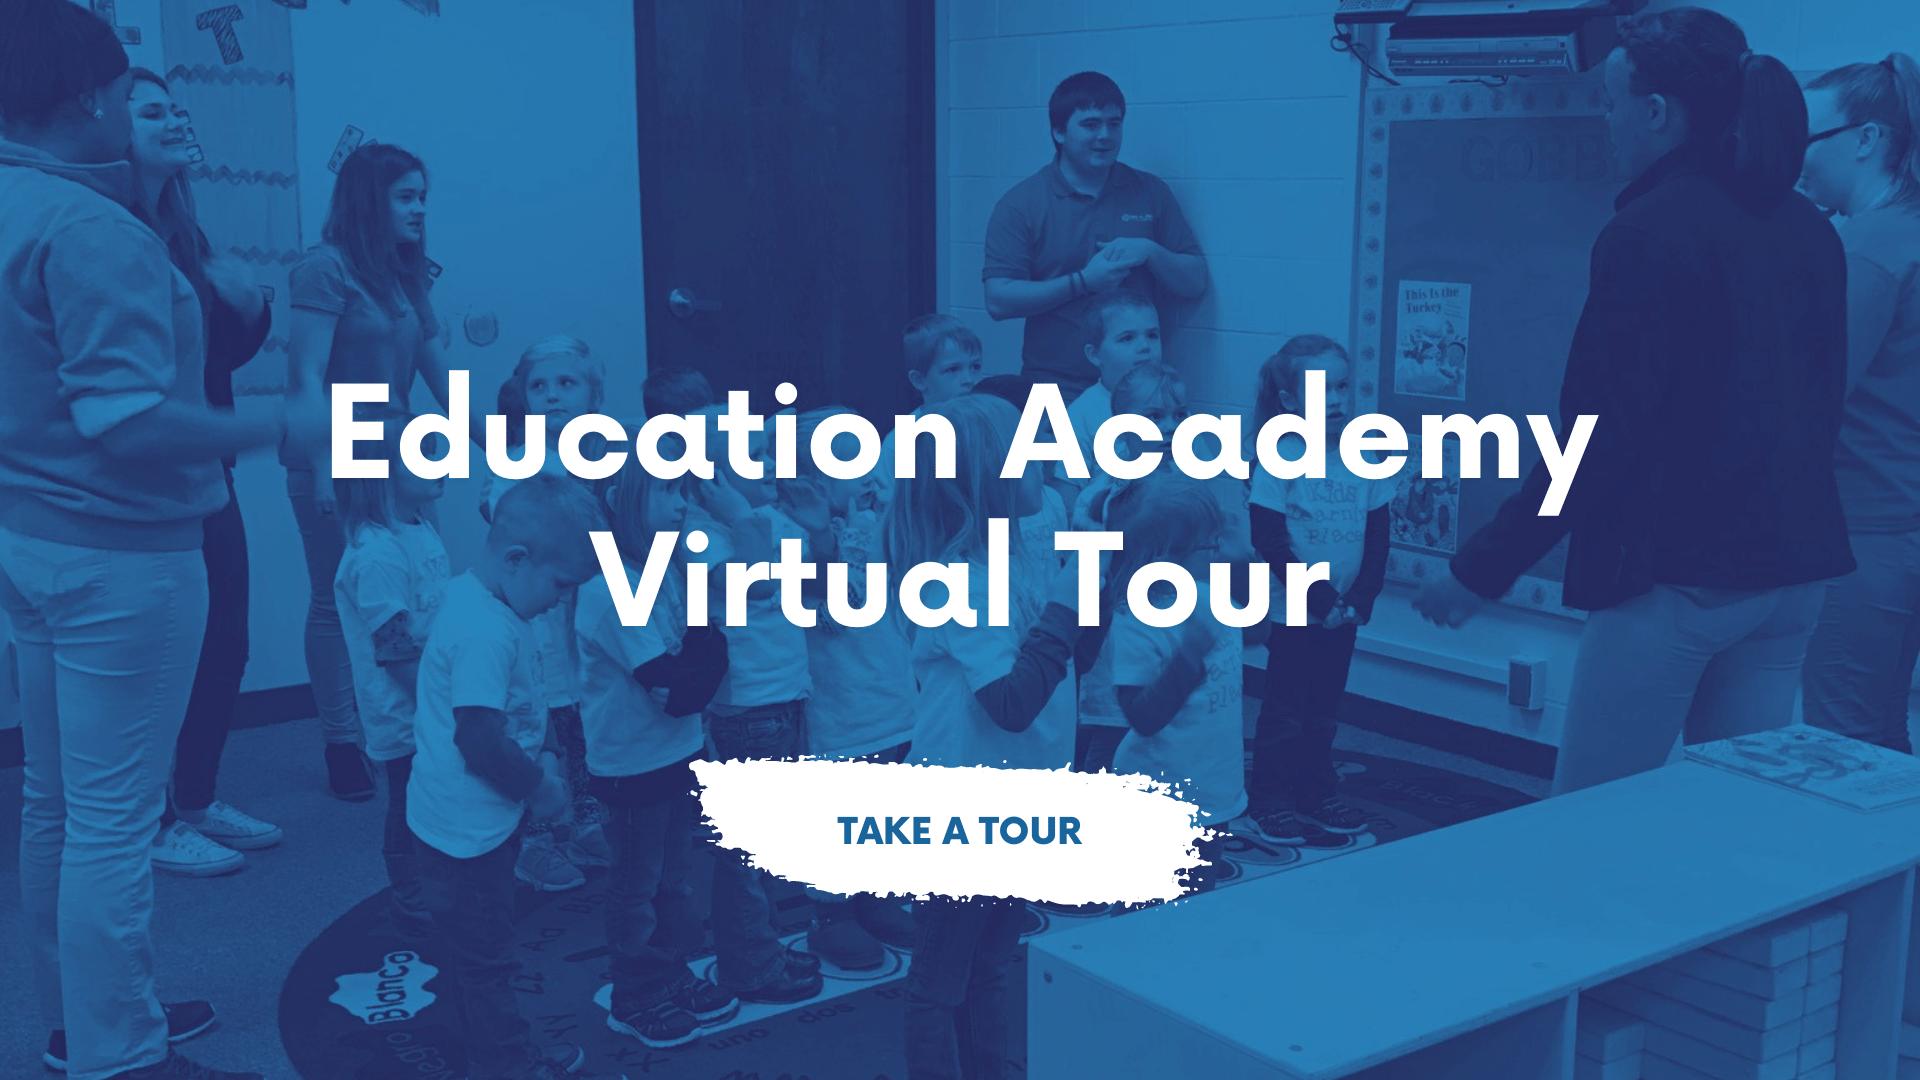 Education Academy Virtual Tour